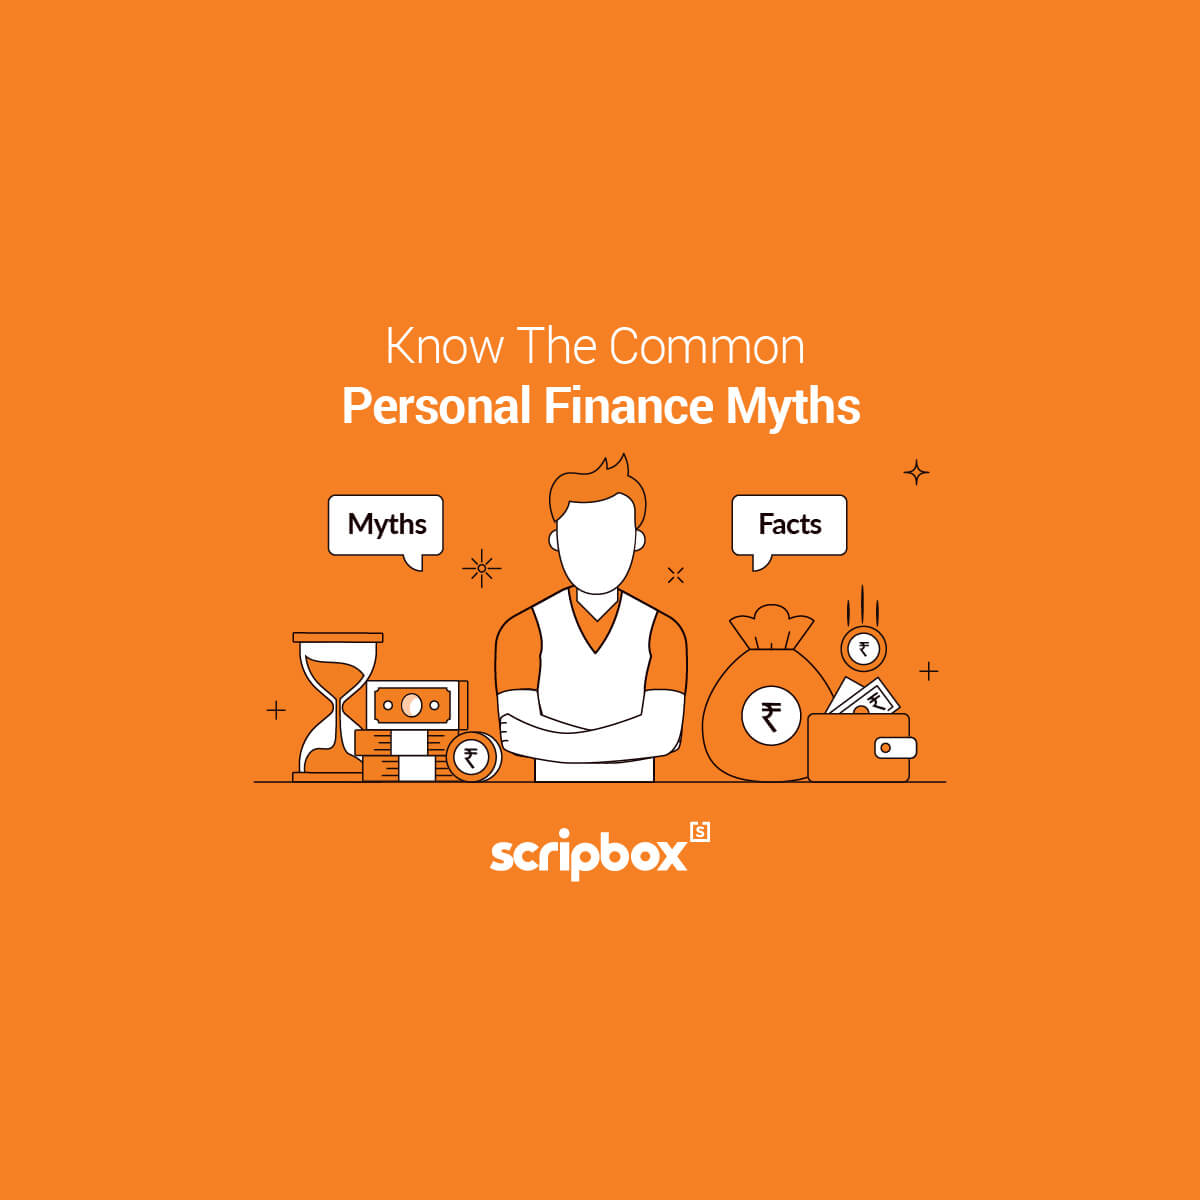 personal finance myths